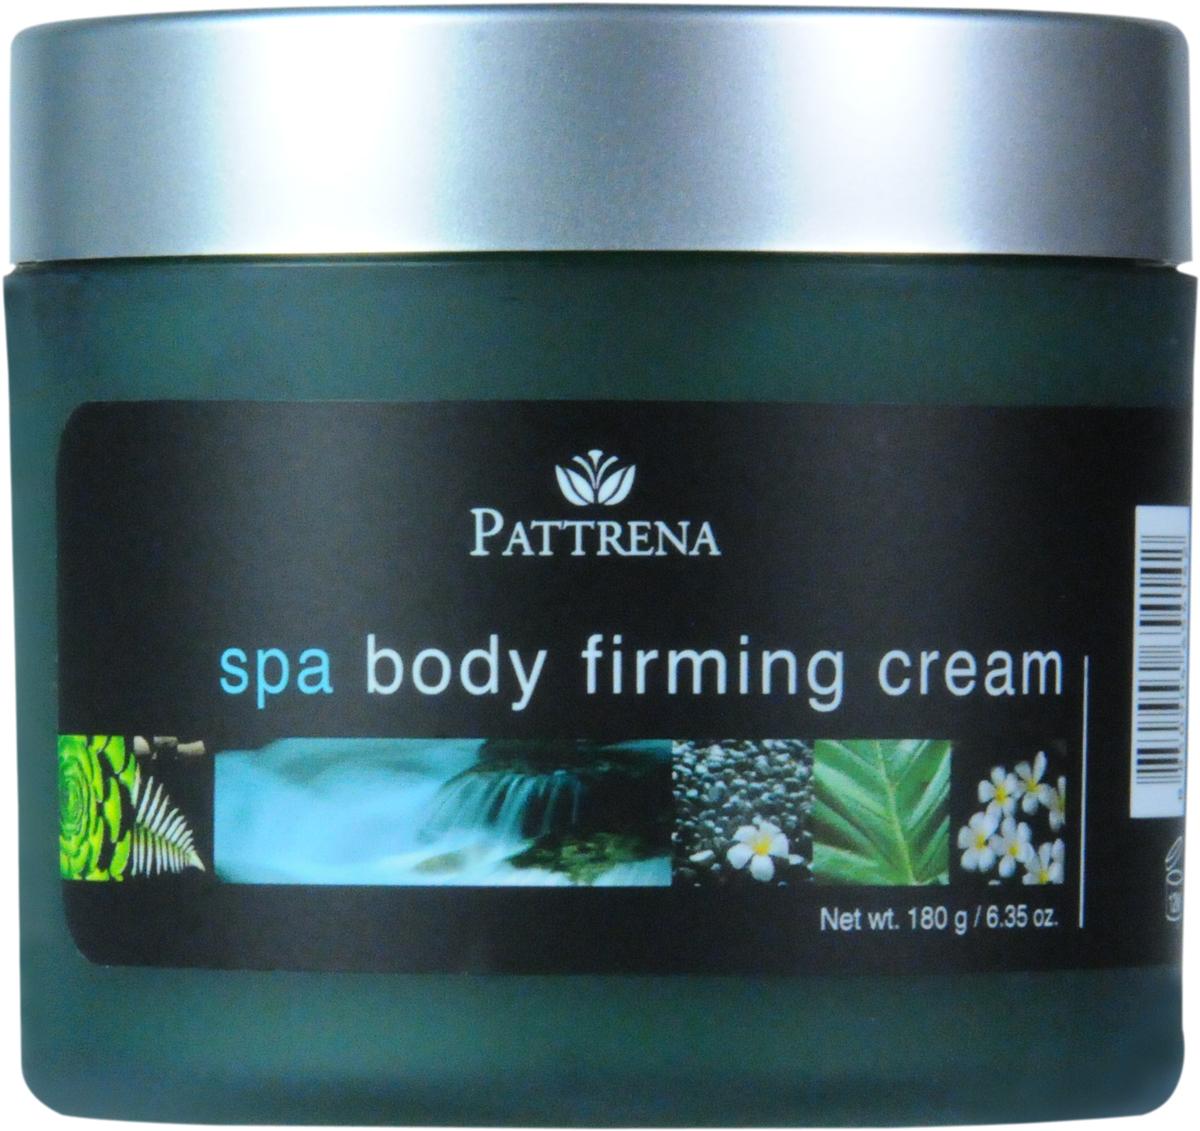 Pattrena Крем для упругости кожи тела Паттрена Спа Firming, 180 г гели pattrena гель для душа паттрена чайное дерево